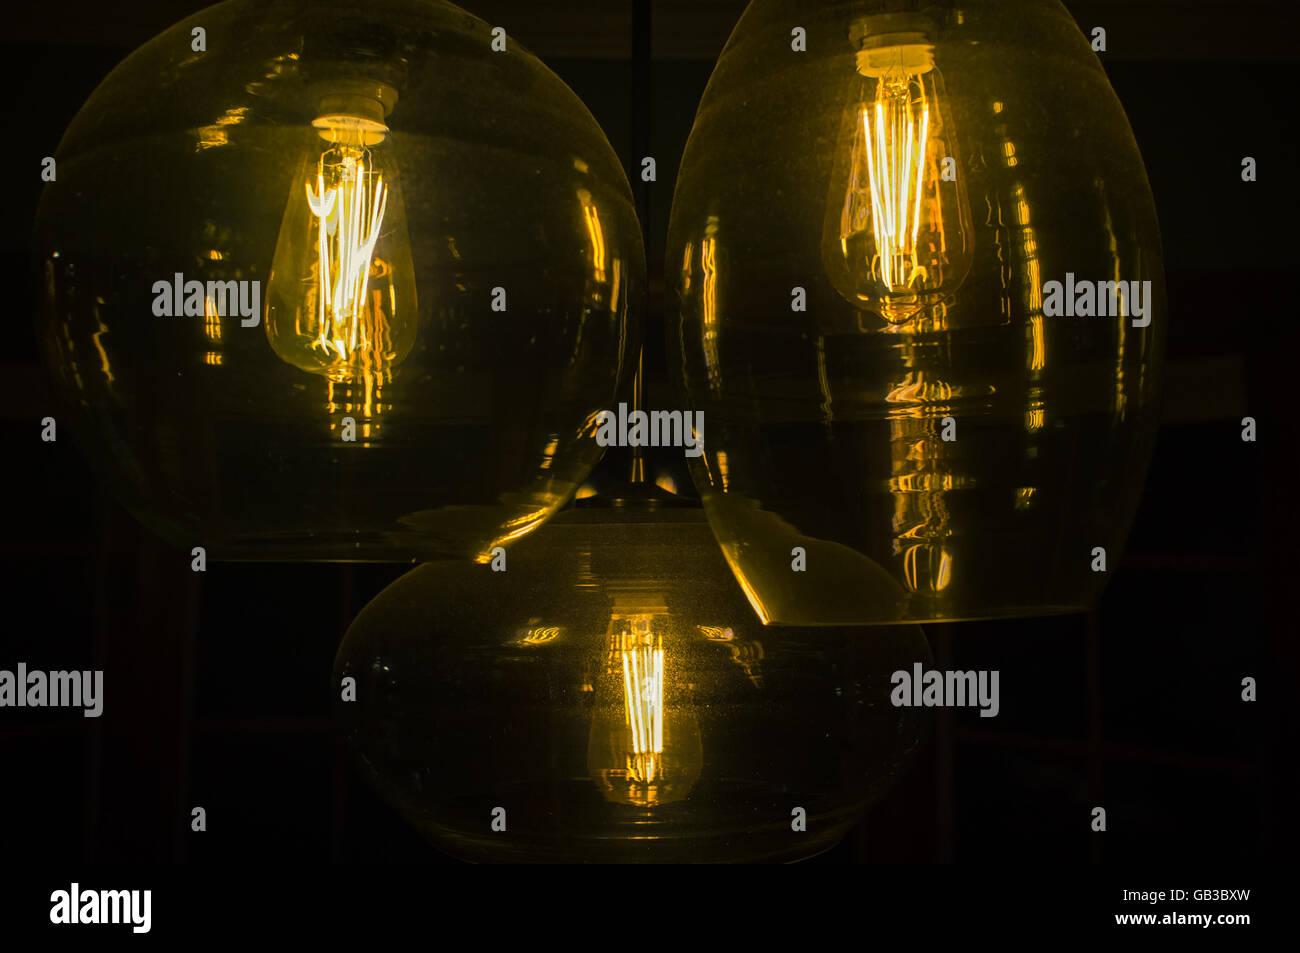 Decorative Antique Edison Style Light Bulbs Chandelier